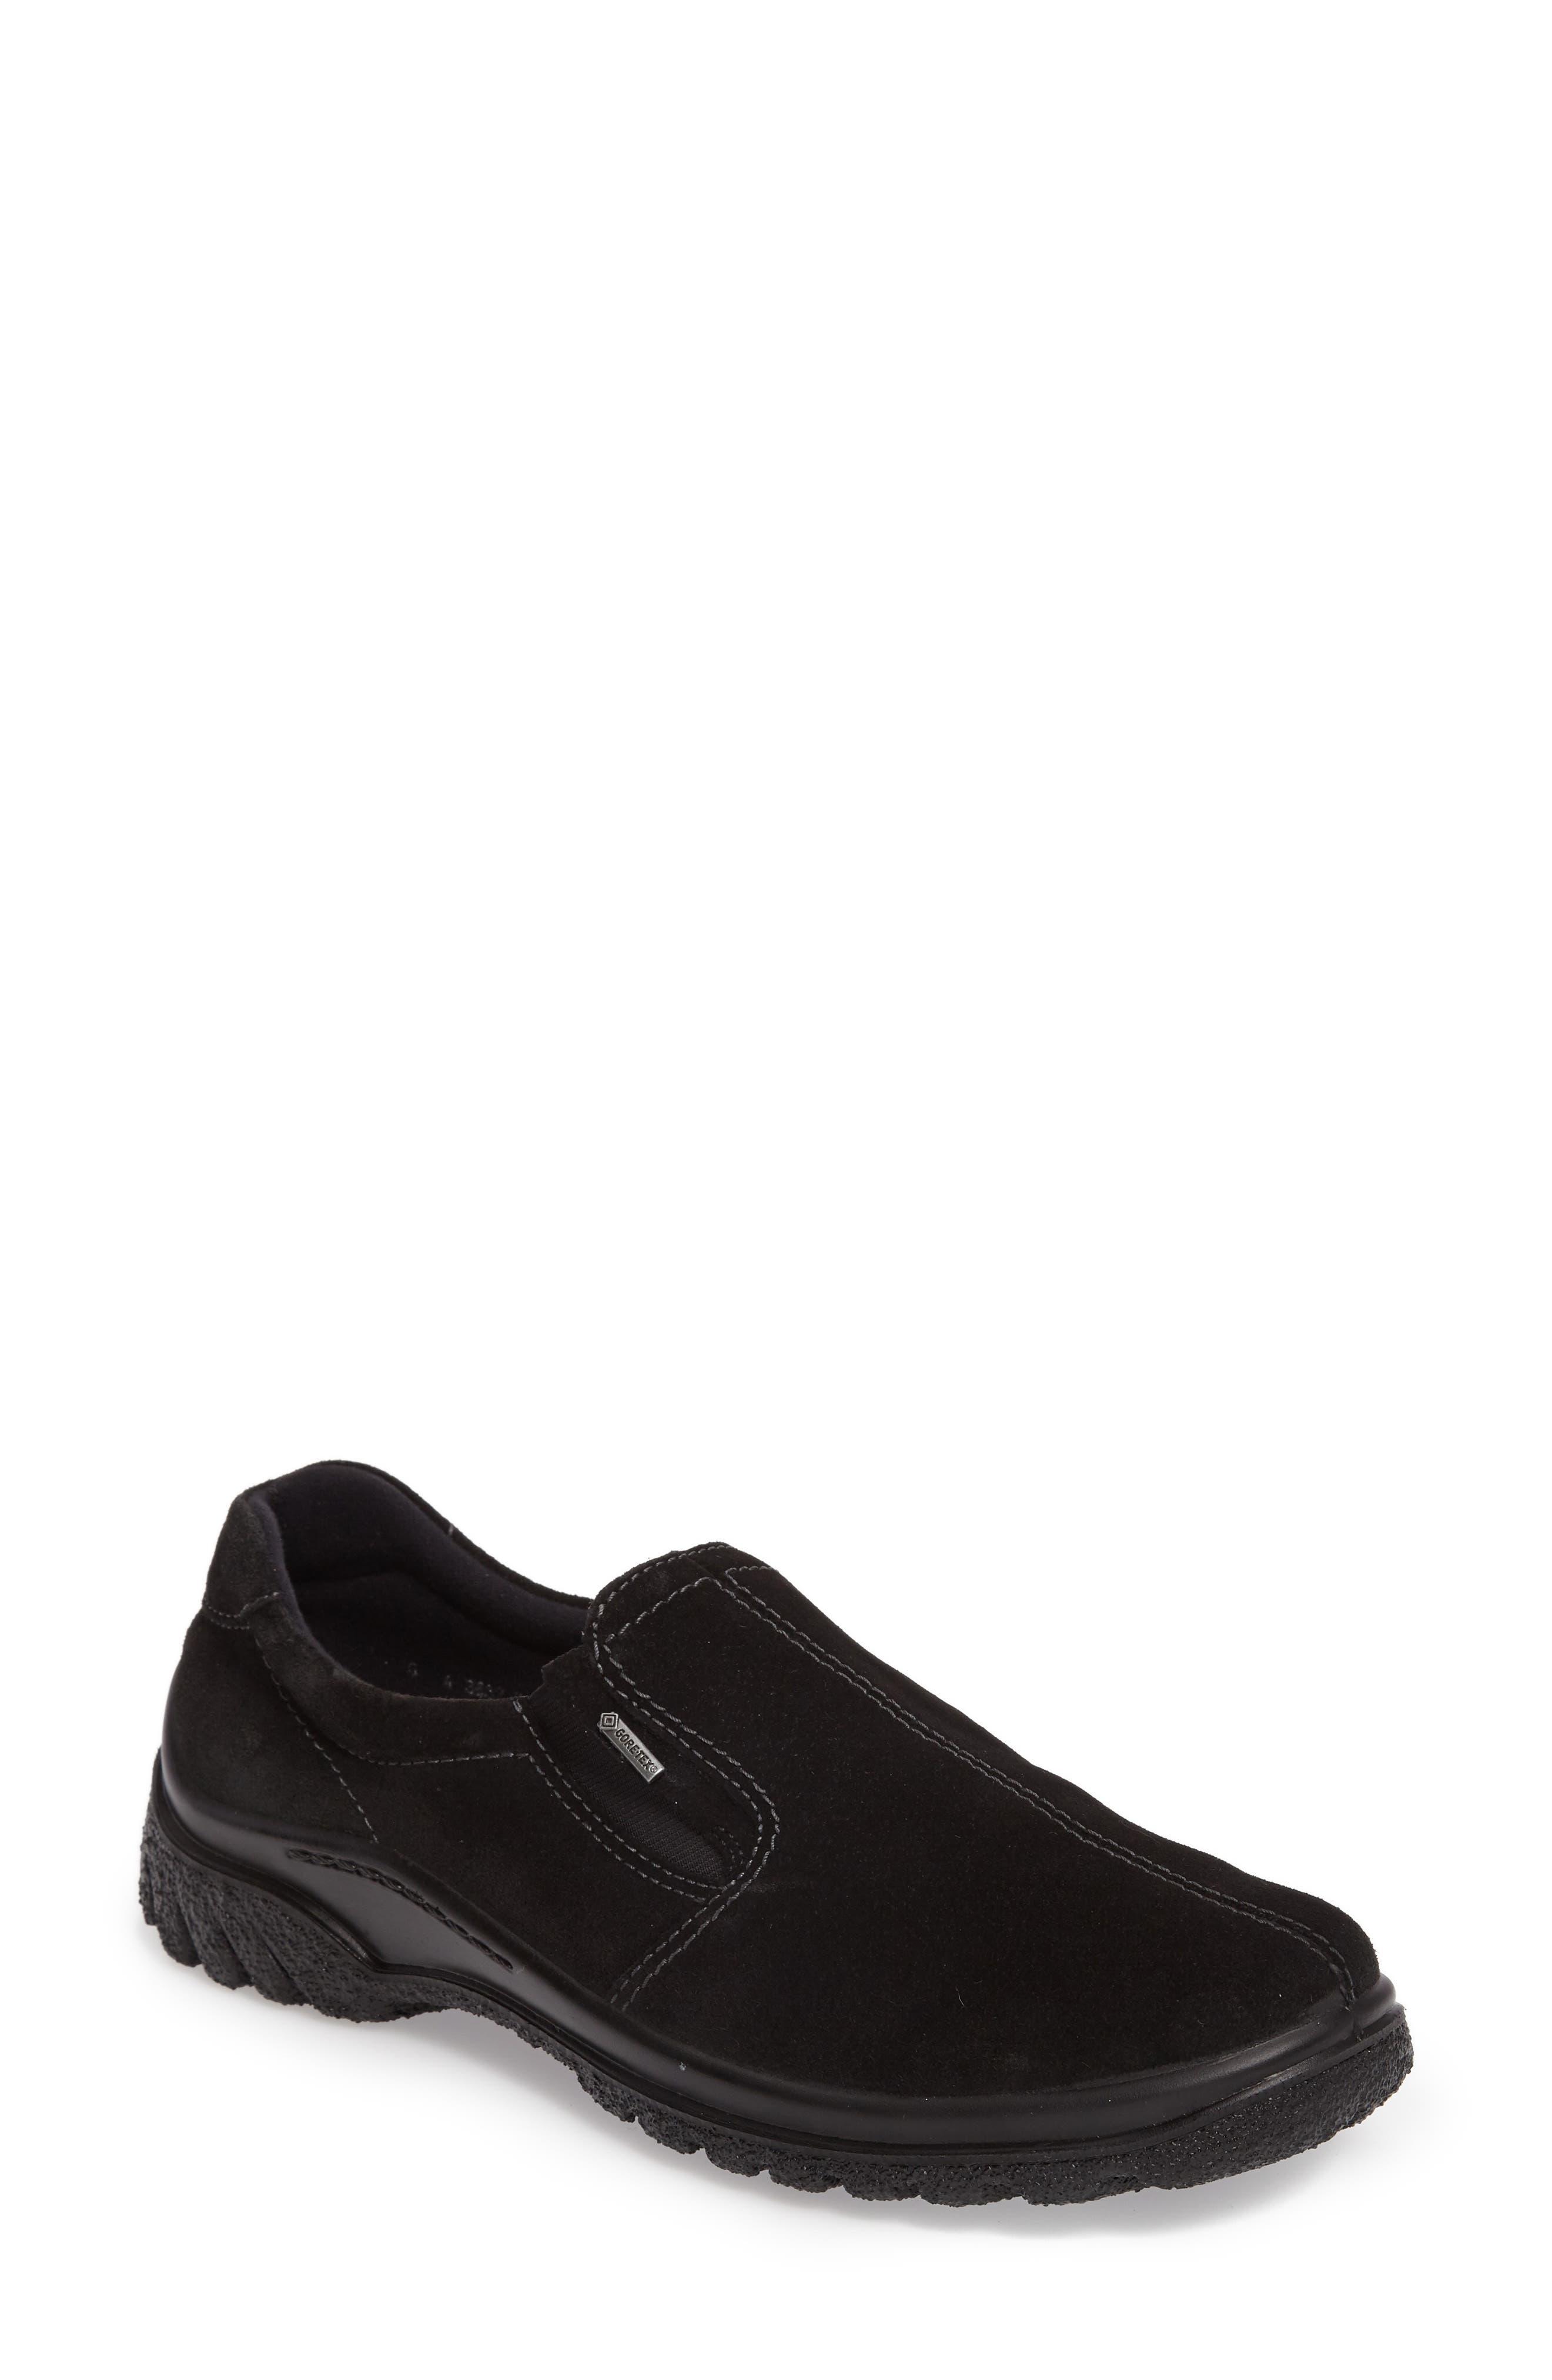 Parson Waterproof Gore-Tex<sup>®</sup> Slip-On Sneaker,                             Main thumbnail 1, color,                             001